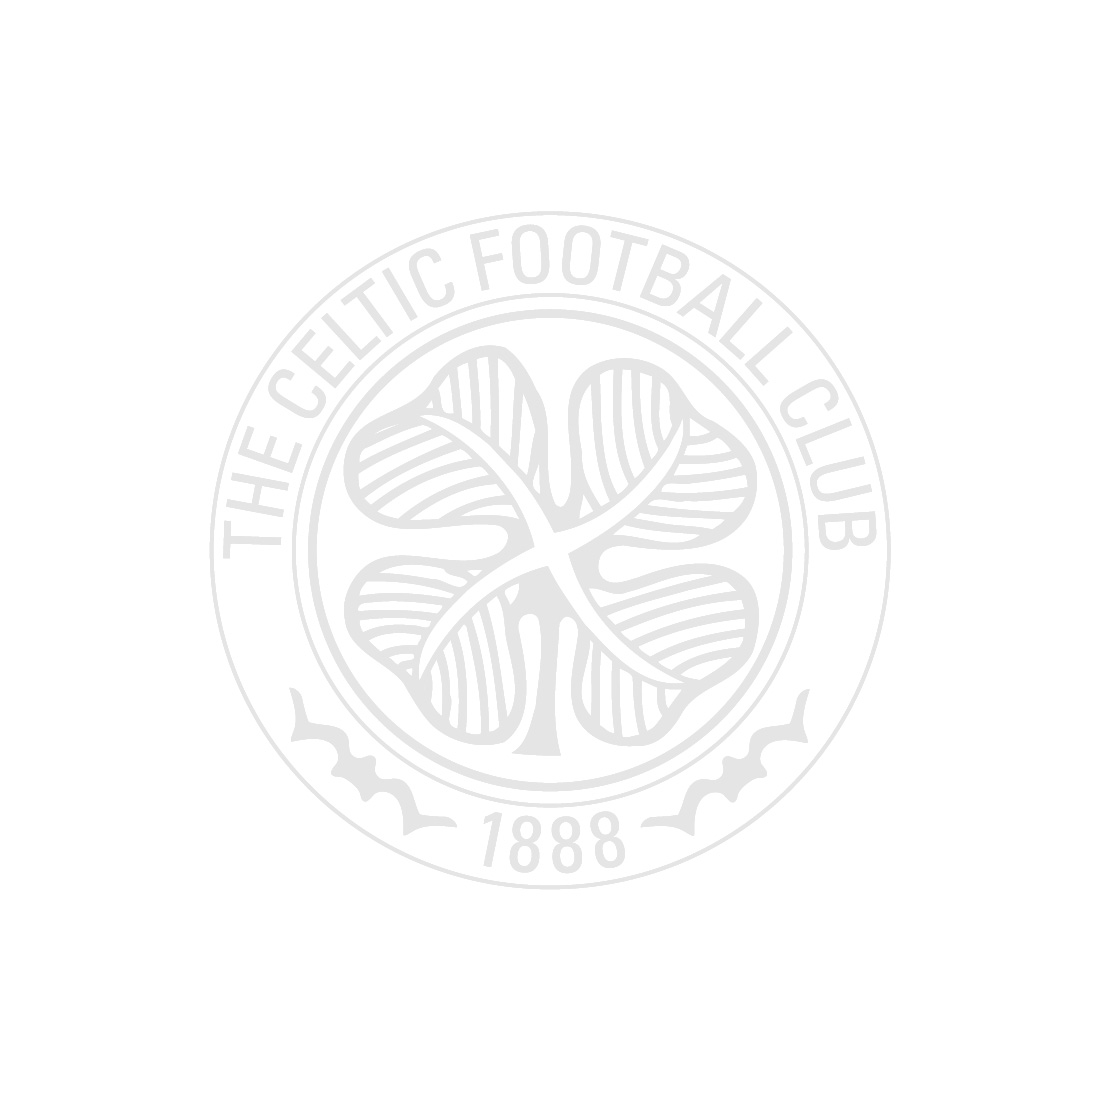 Celtic FC Initials Hooded Blanket